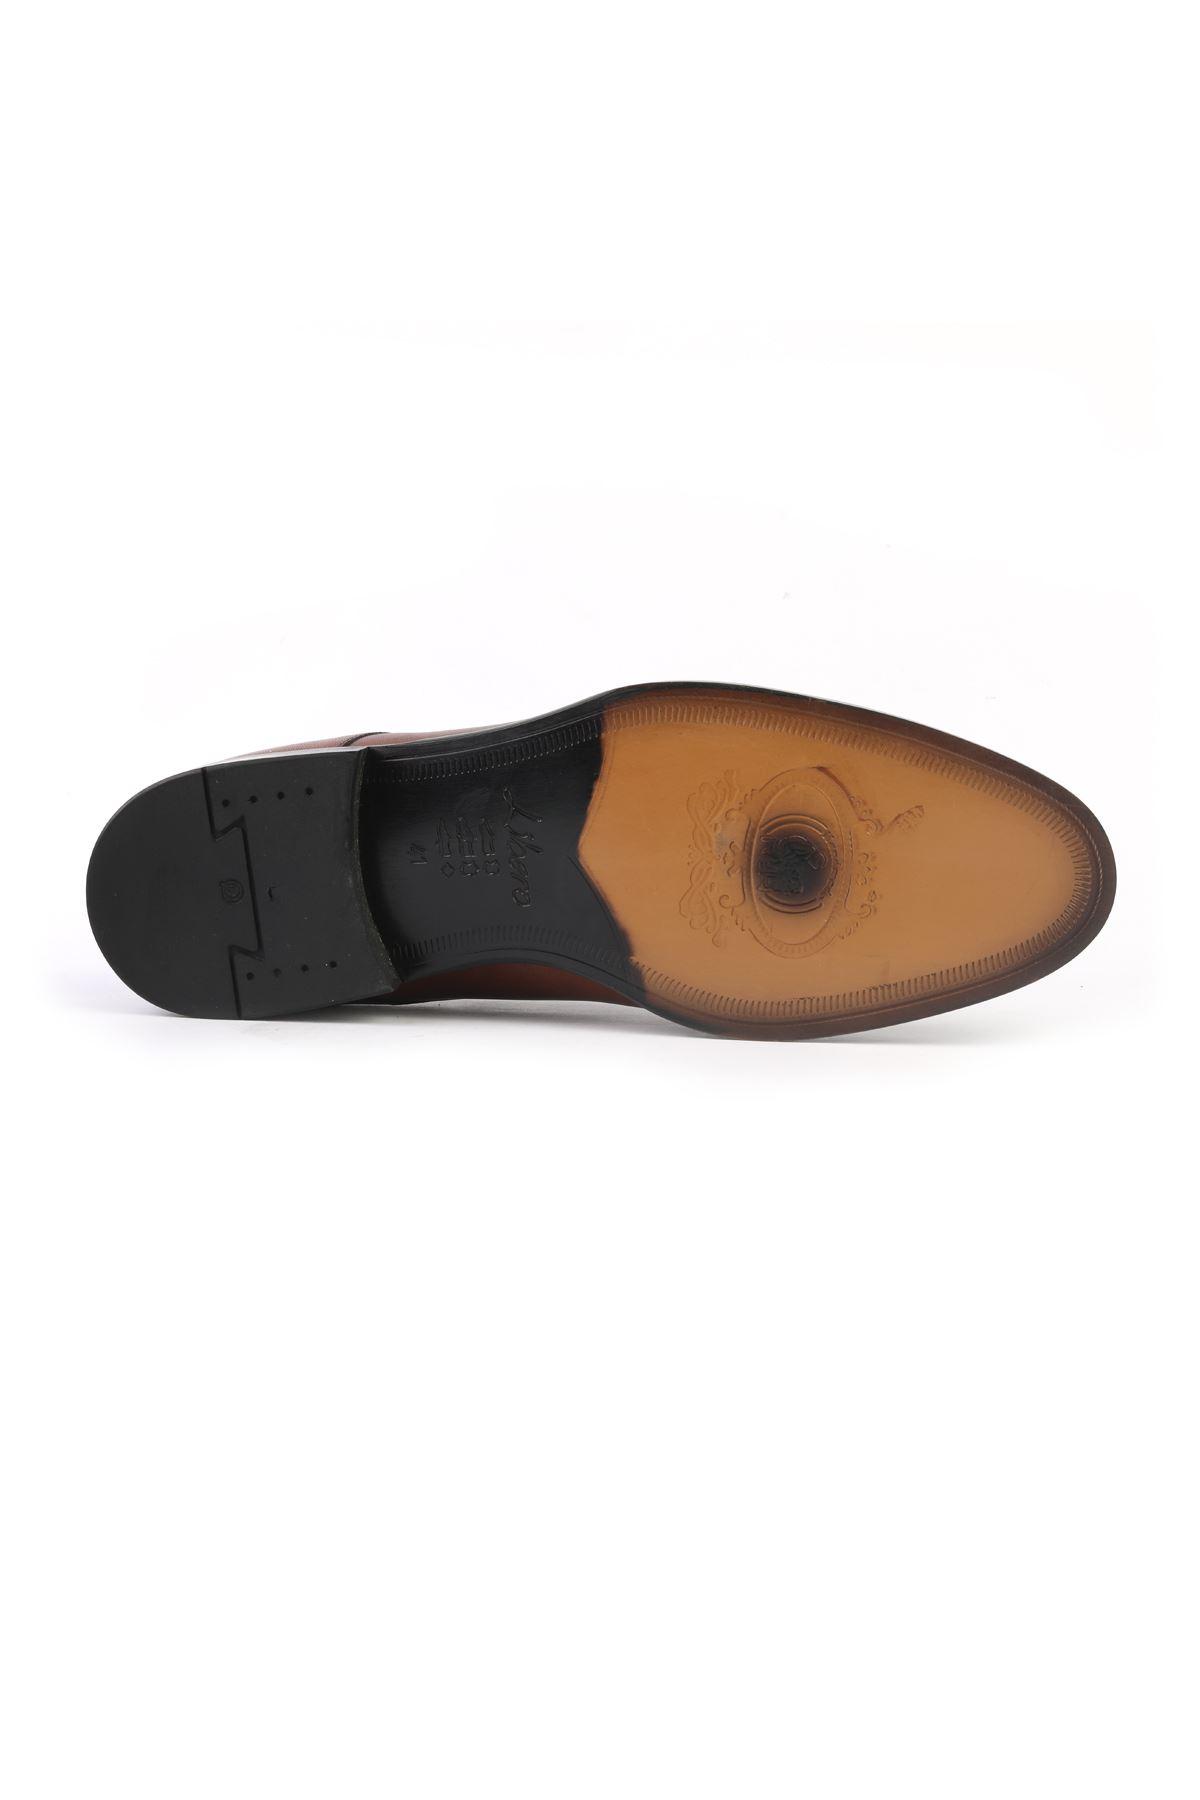 Libero T1135 Tan Classic Shoes